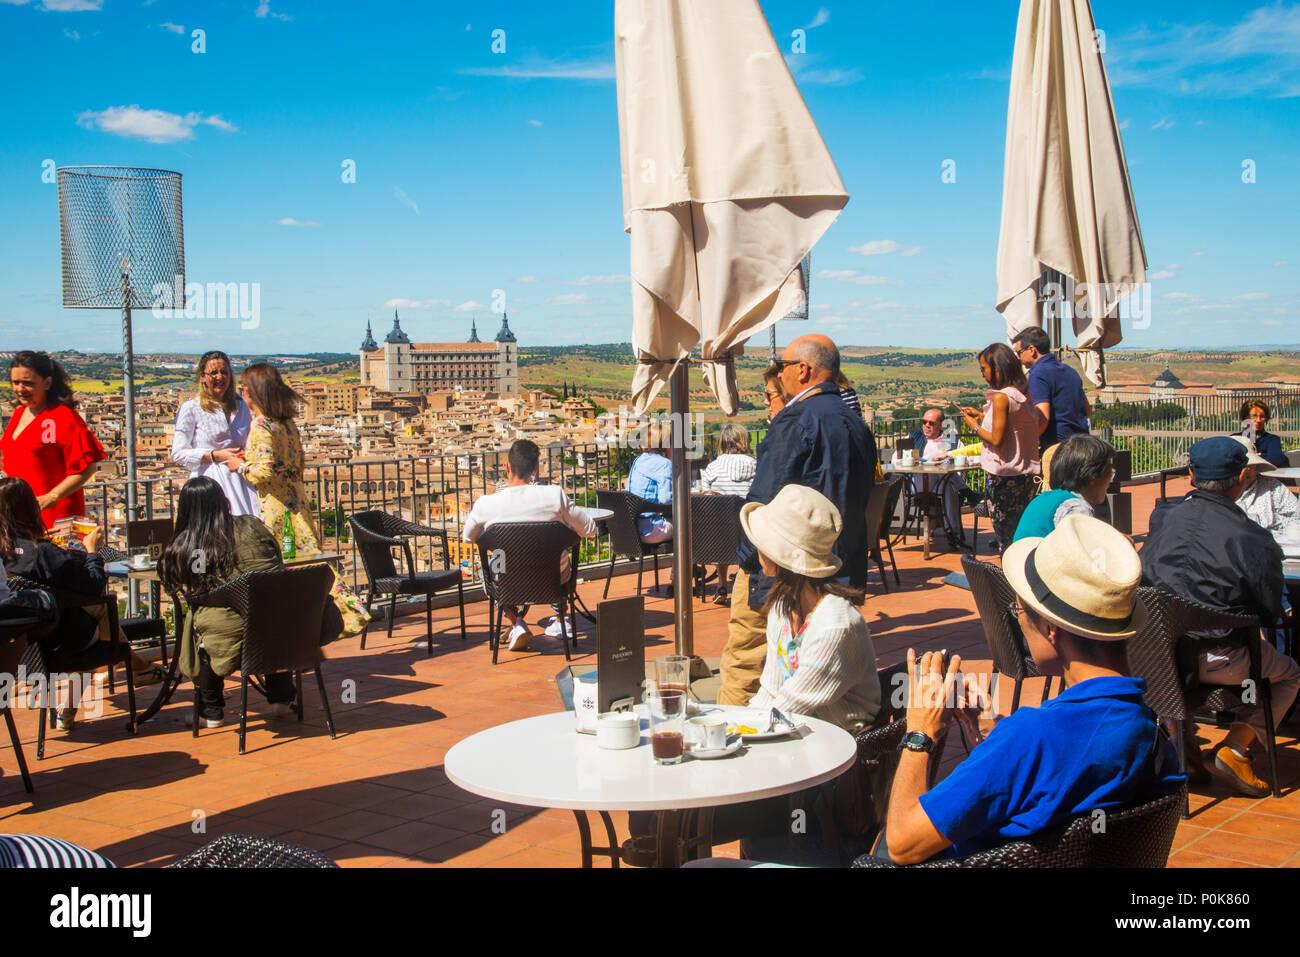 Tourists at the terrace. Parador, Toledo, Spain. - Stock Image